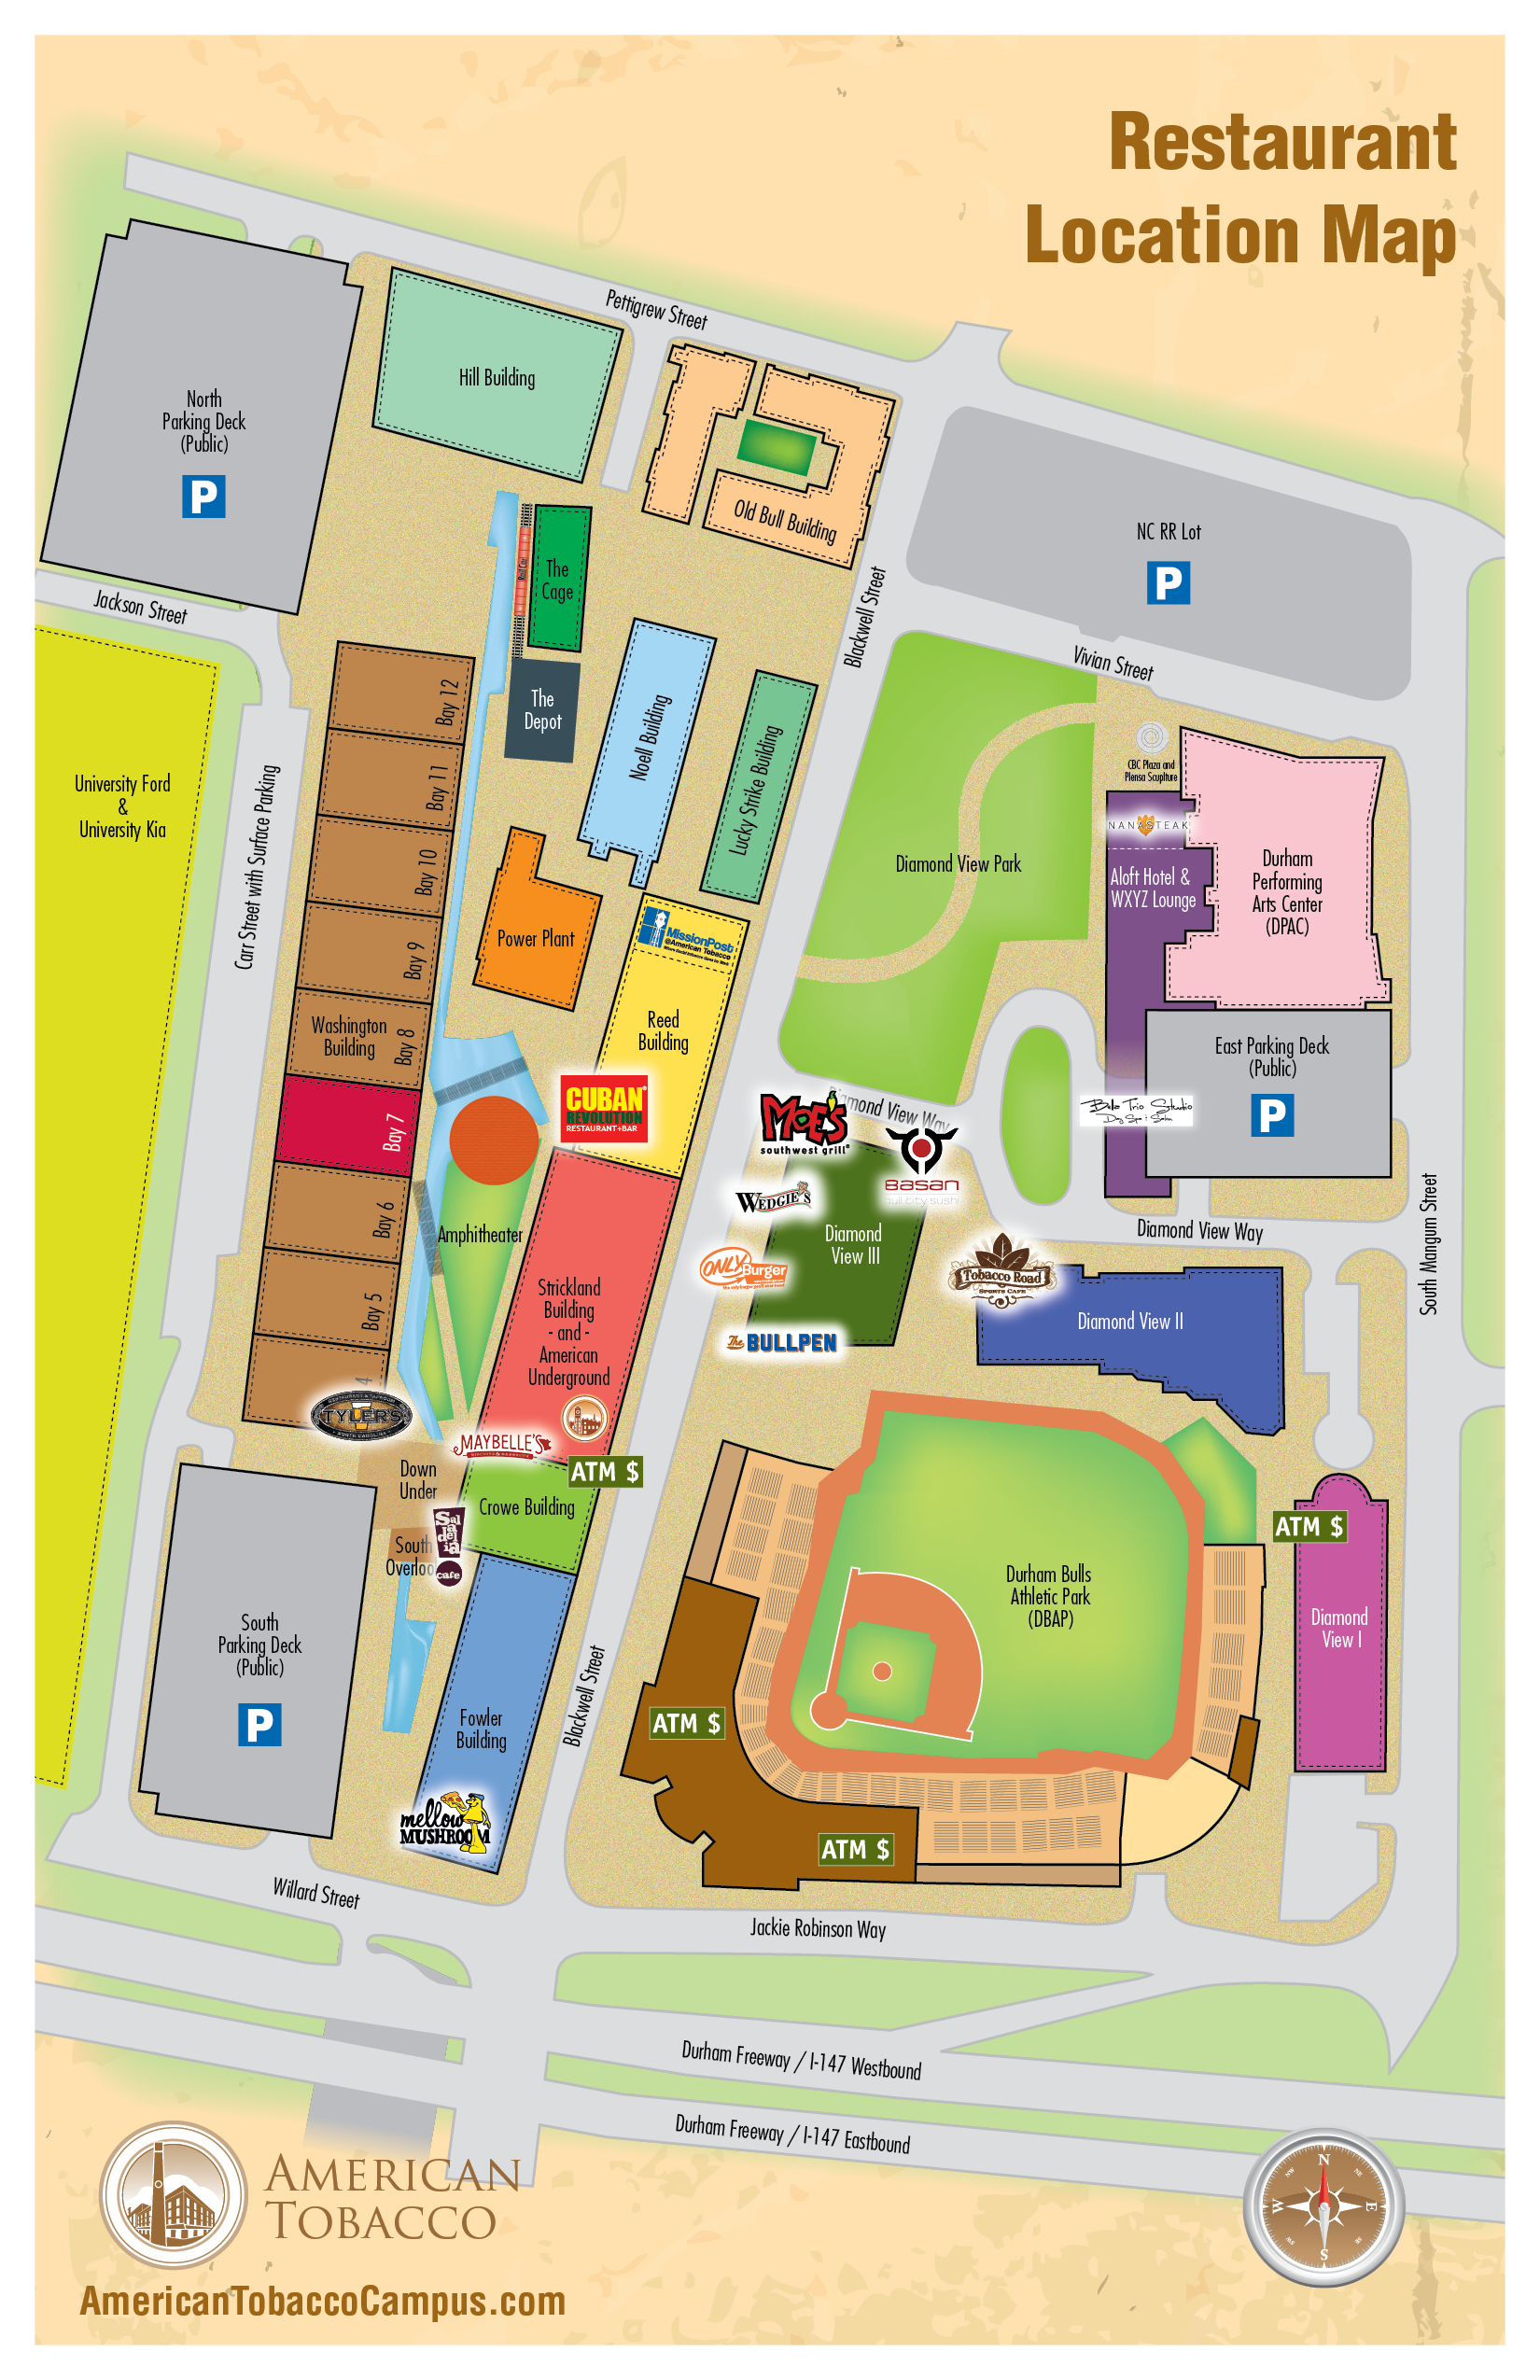 American Tobacco Campus - Us baseball map